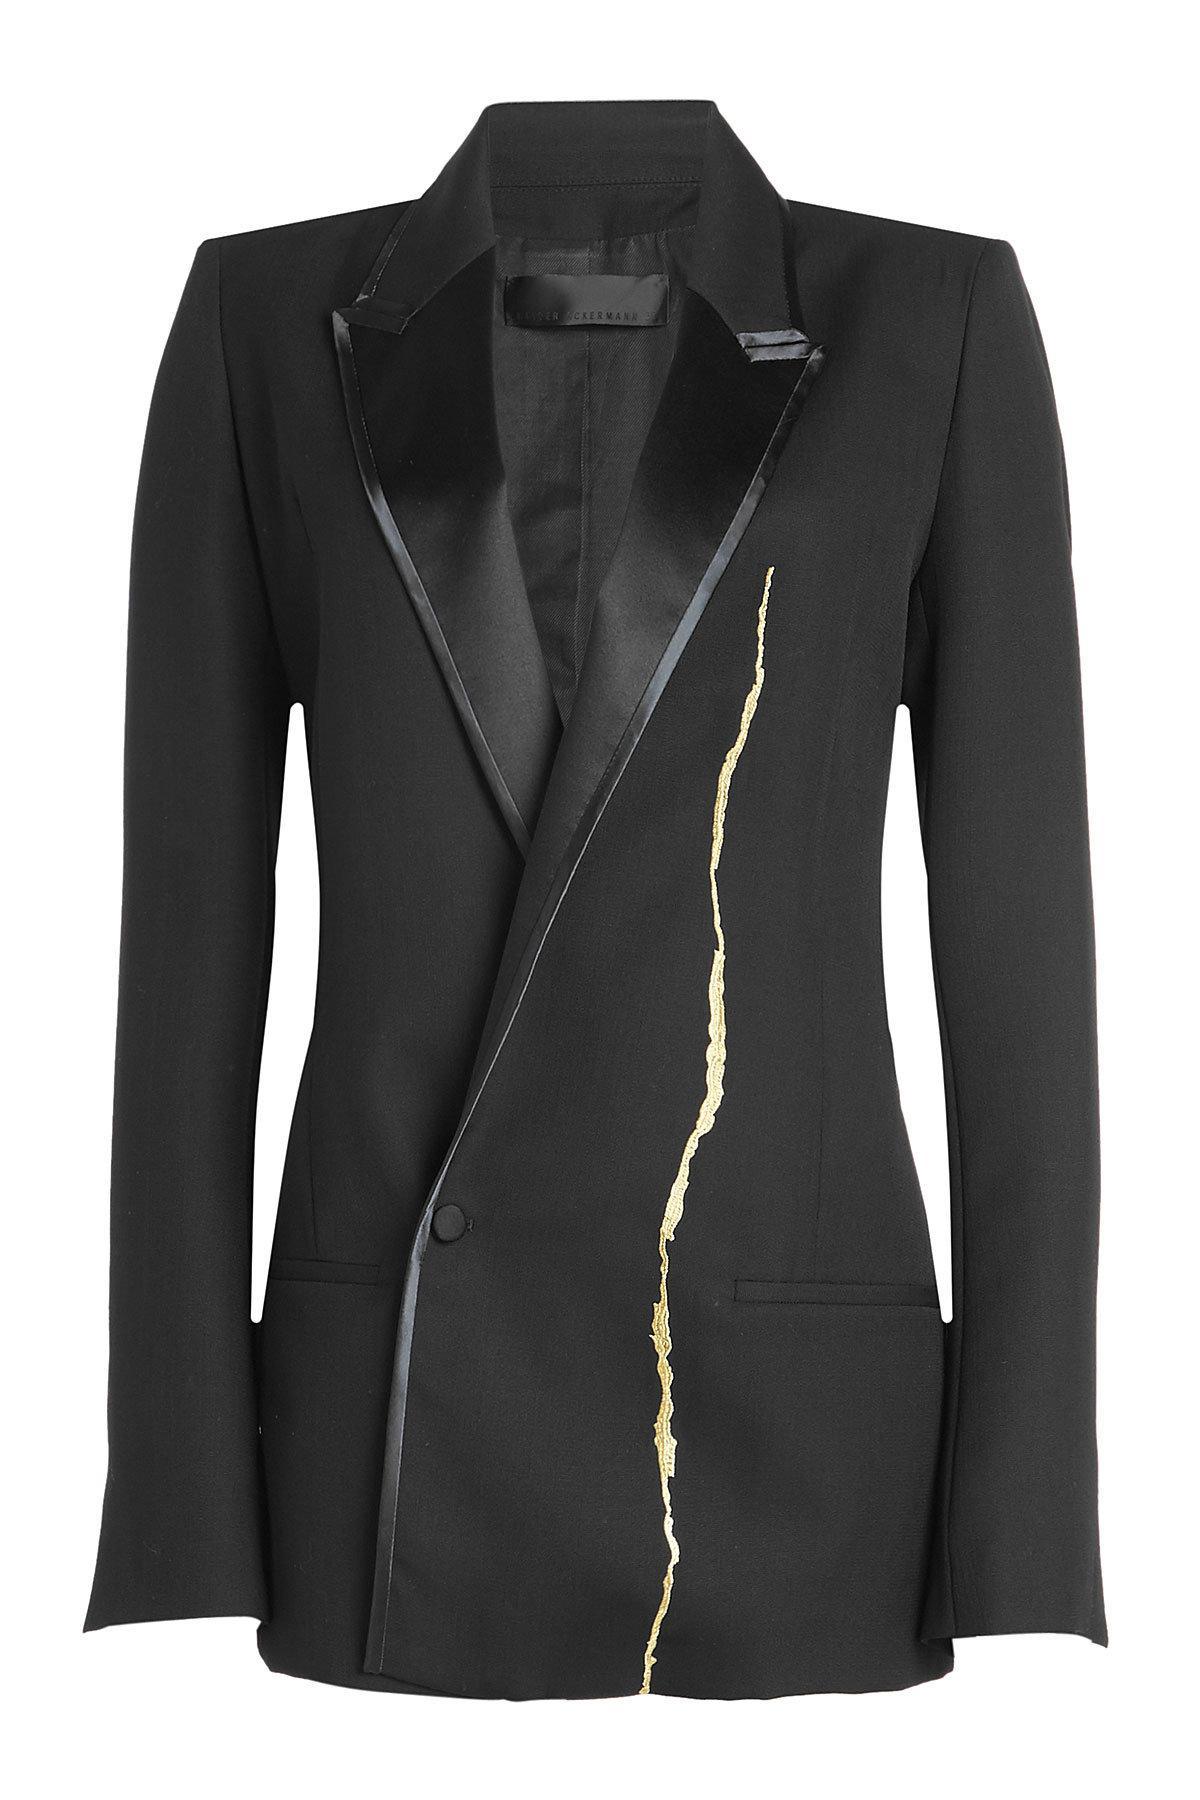 Haider Ackermann Fleecewool Blazer With Metallic Thread In Black